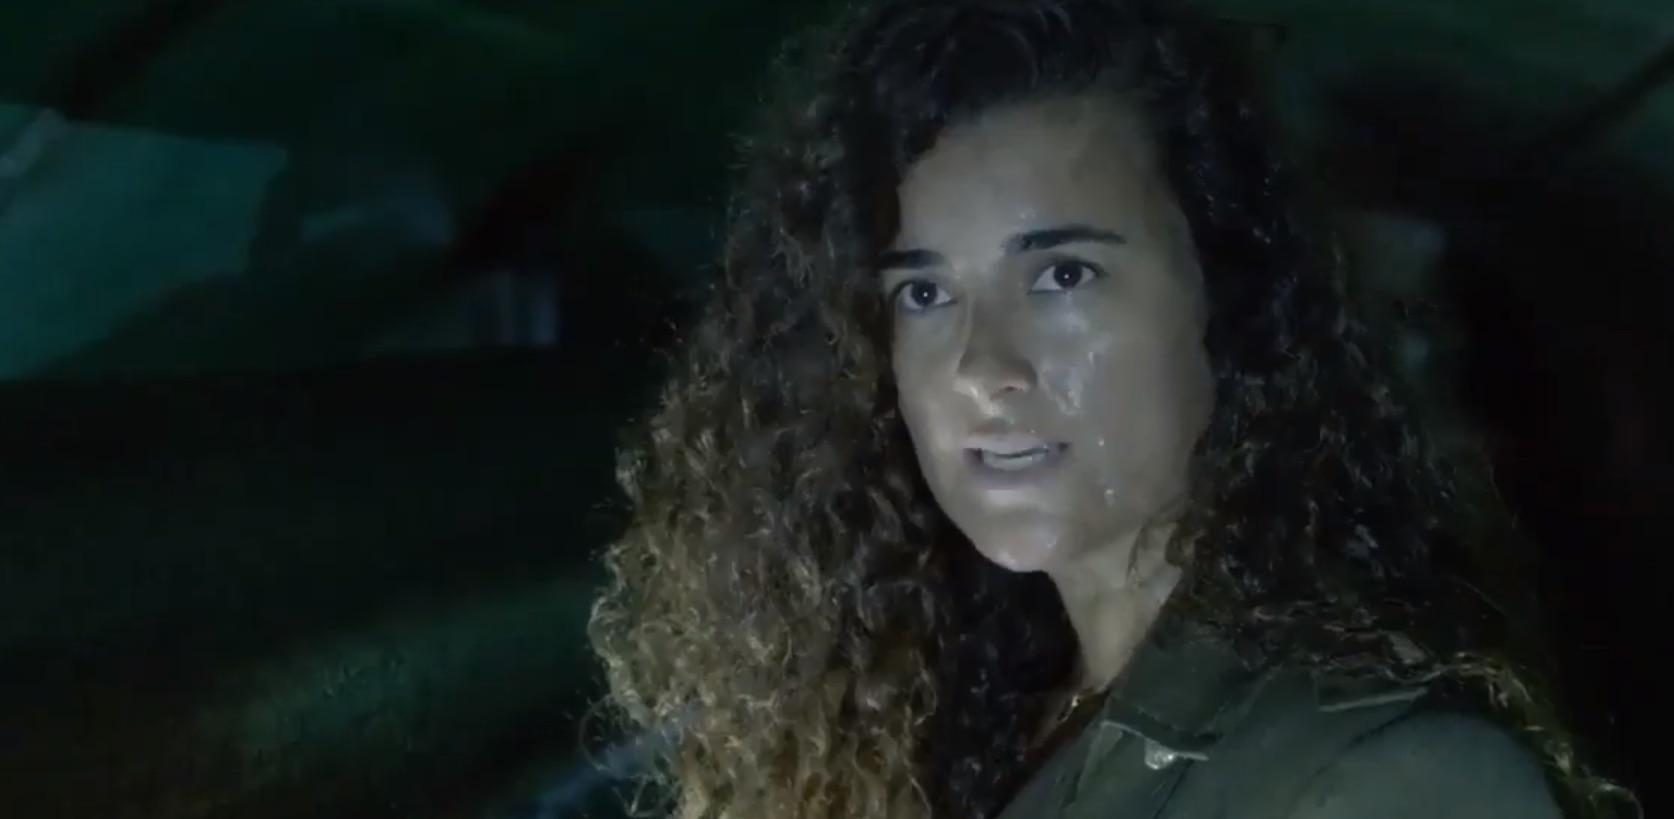 Cote de Pablo, Ziva David, NCIS-https://www.youtube.com/watch?v=6h1LeEtYAW8